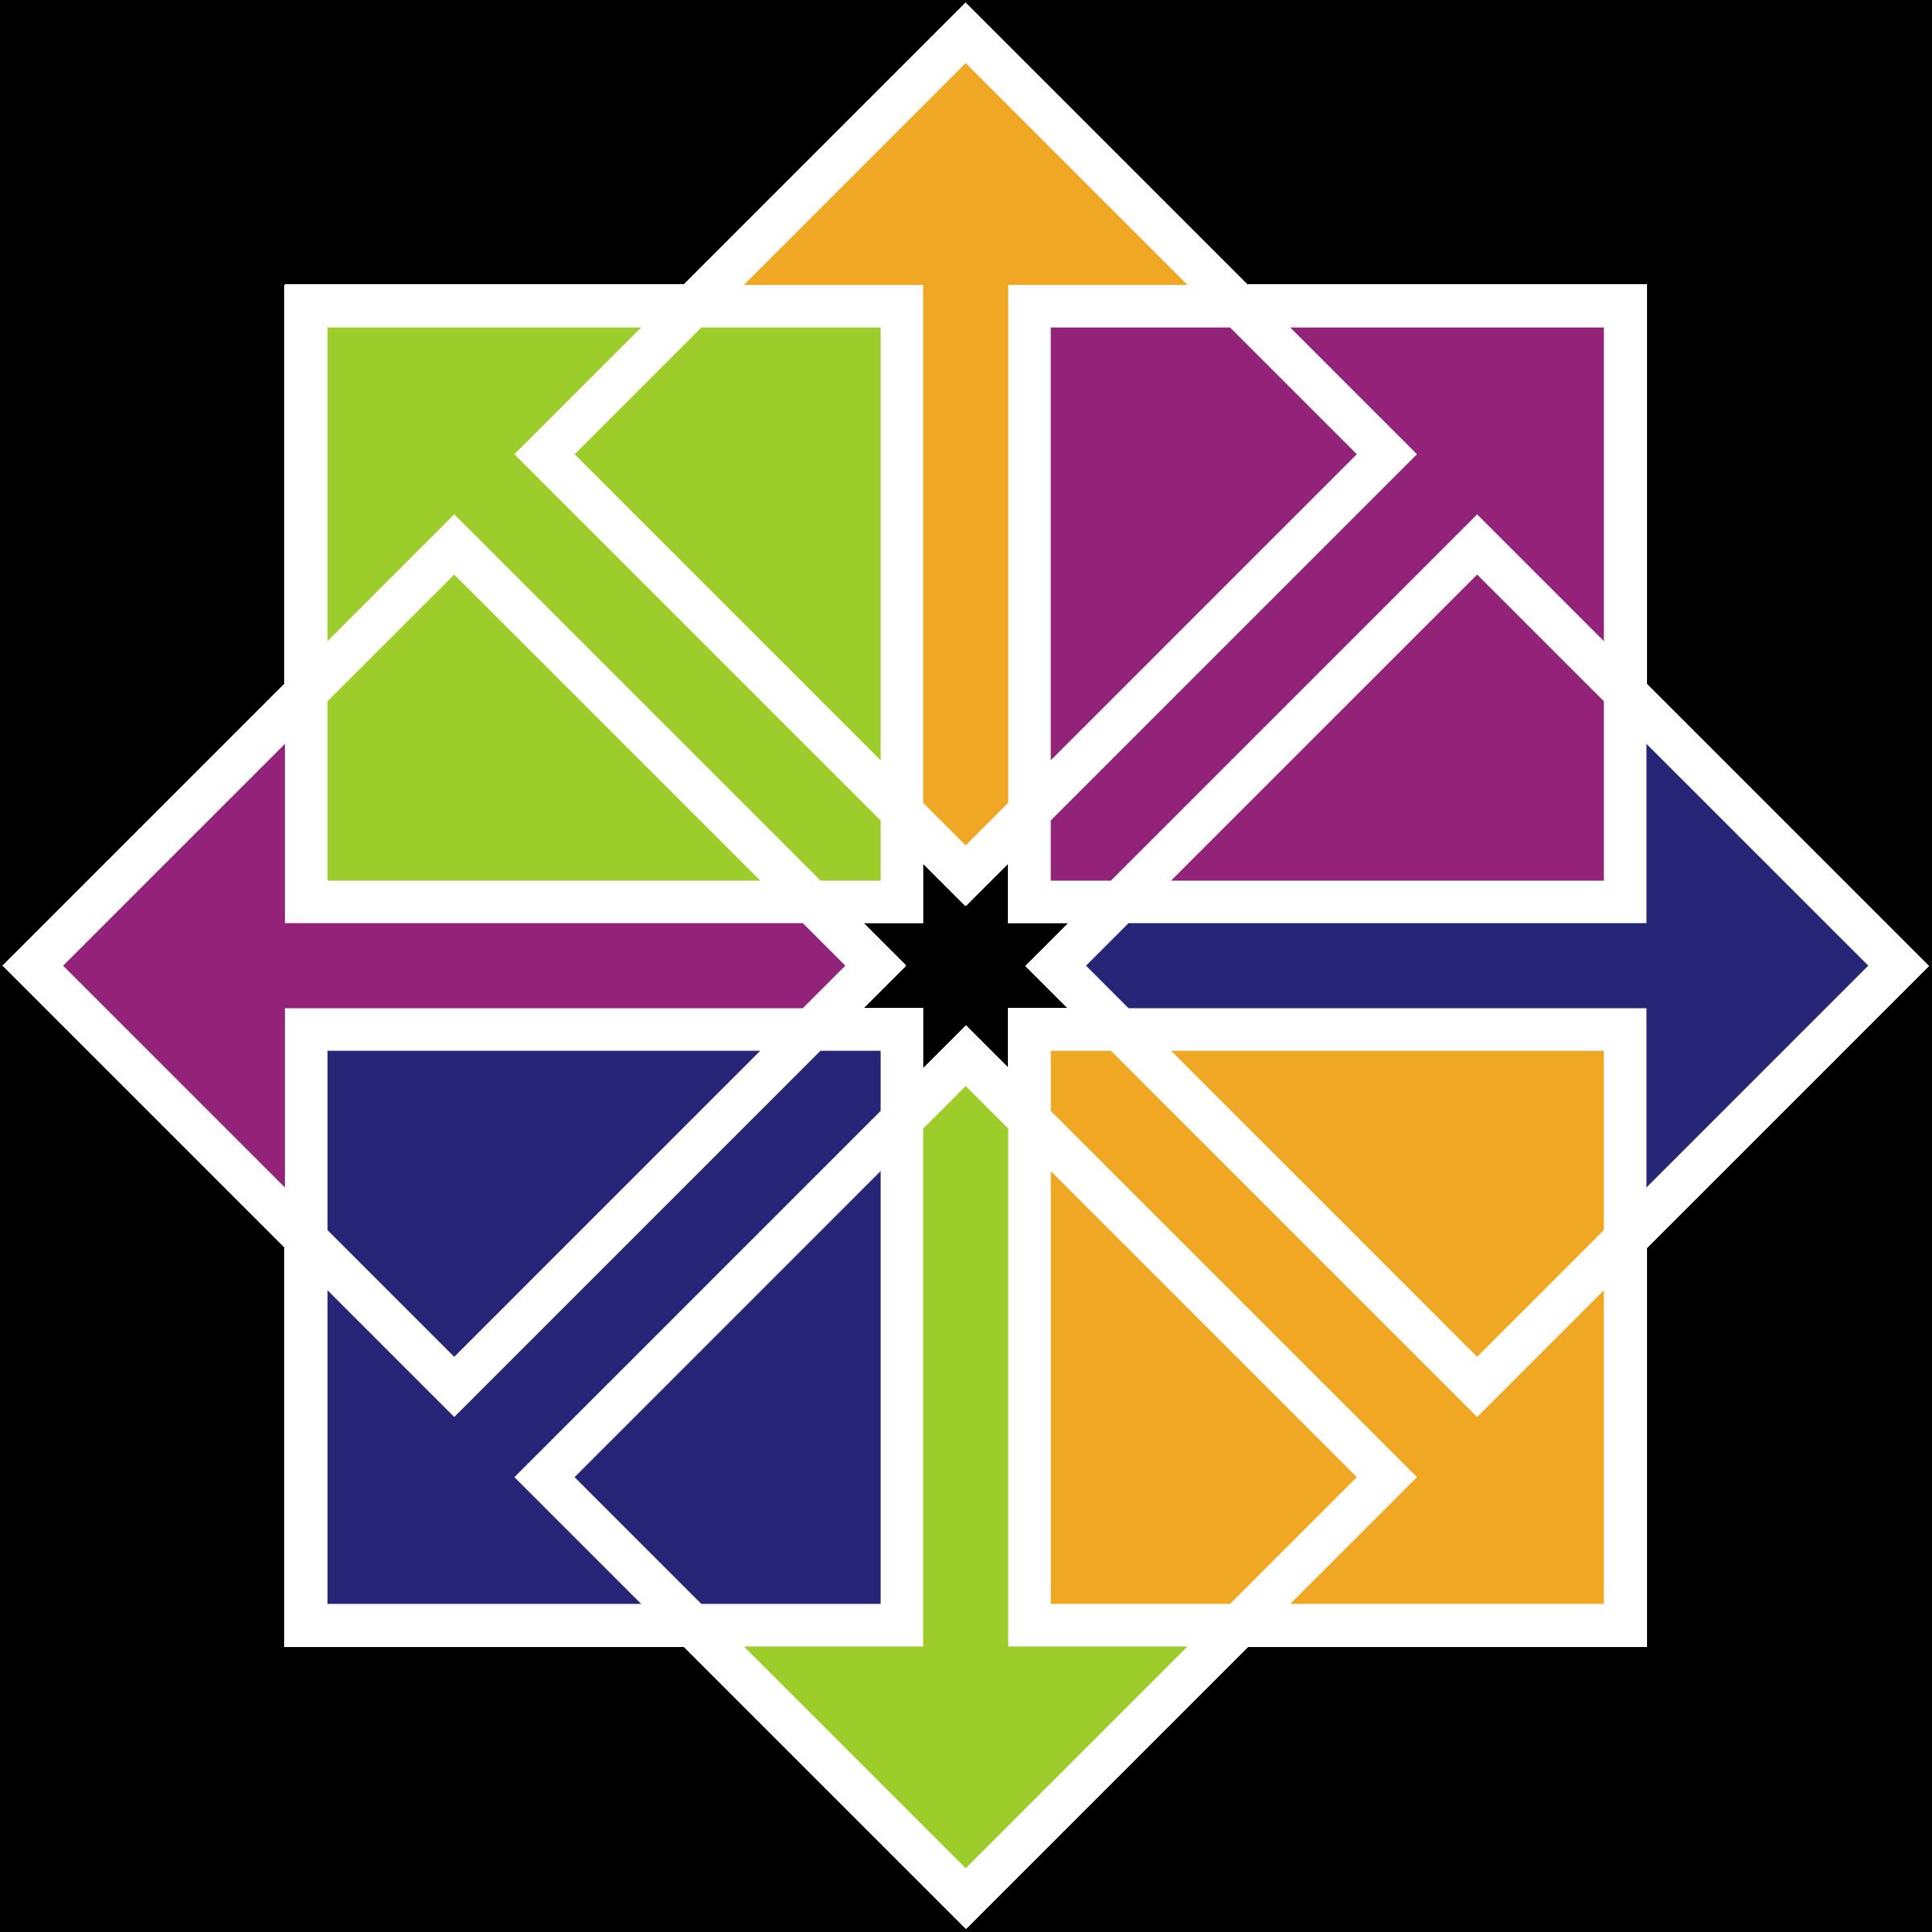 CentOS Logo PNG Transparent & SVG Vector.